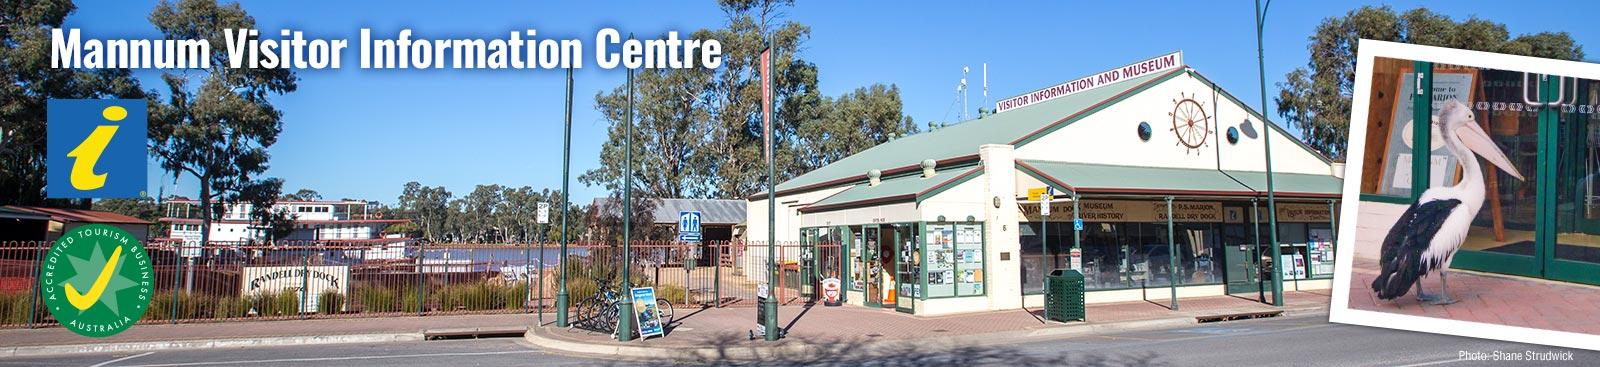 Mannum Visitor Information Centre